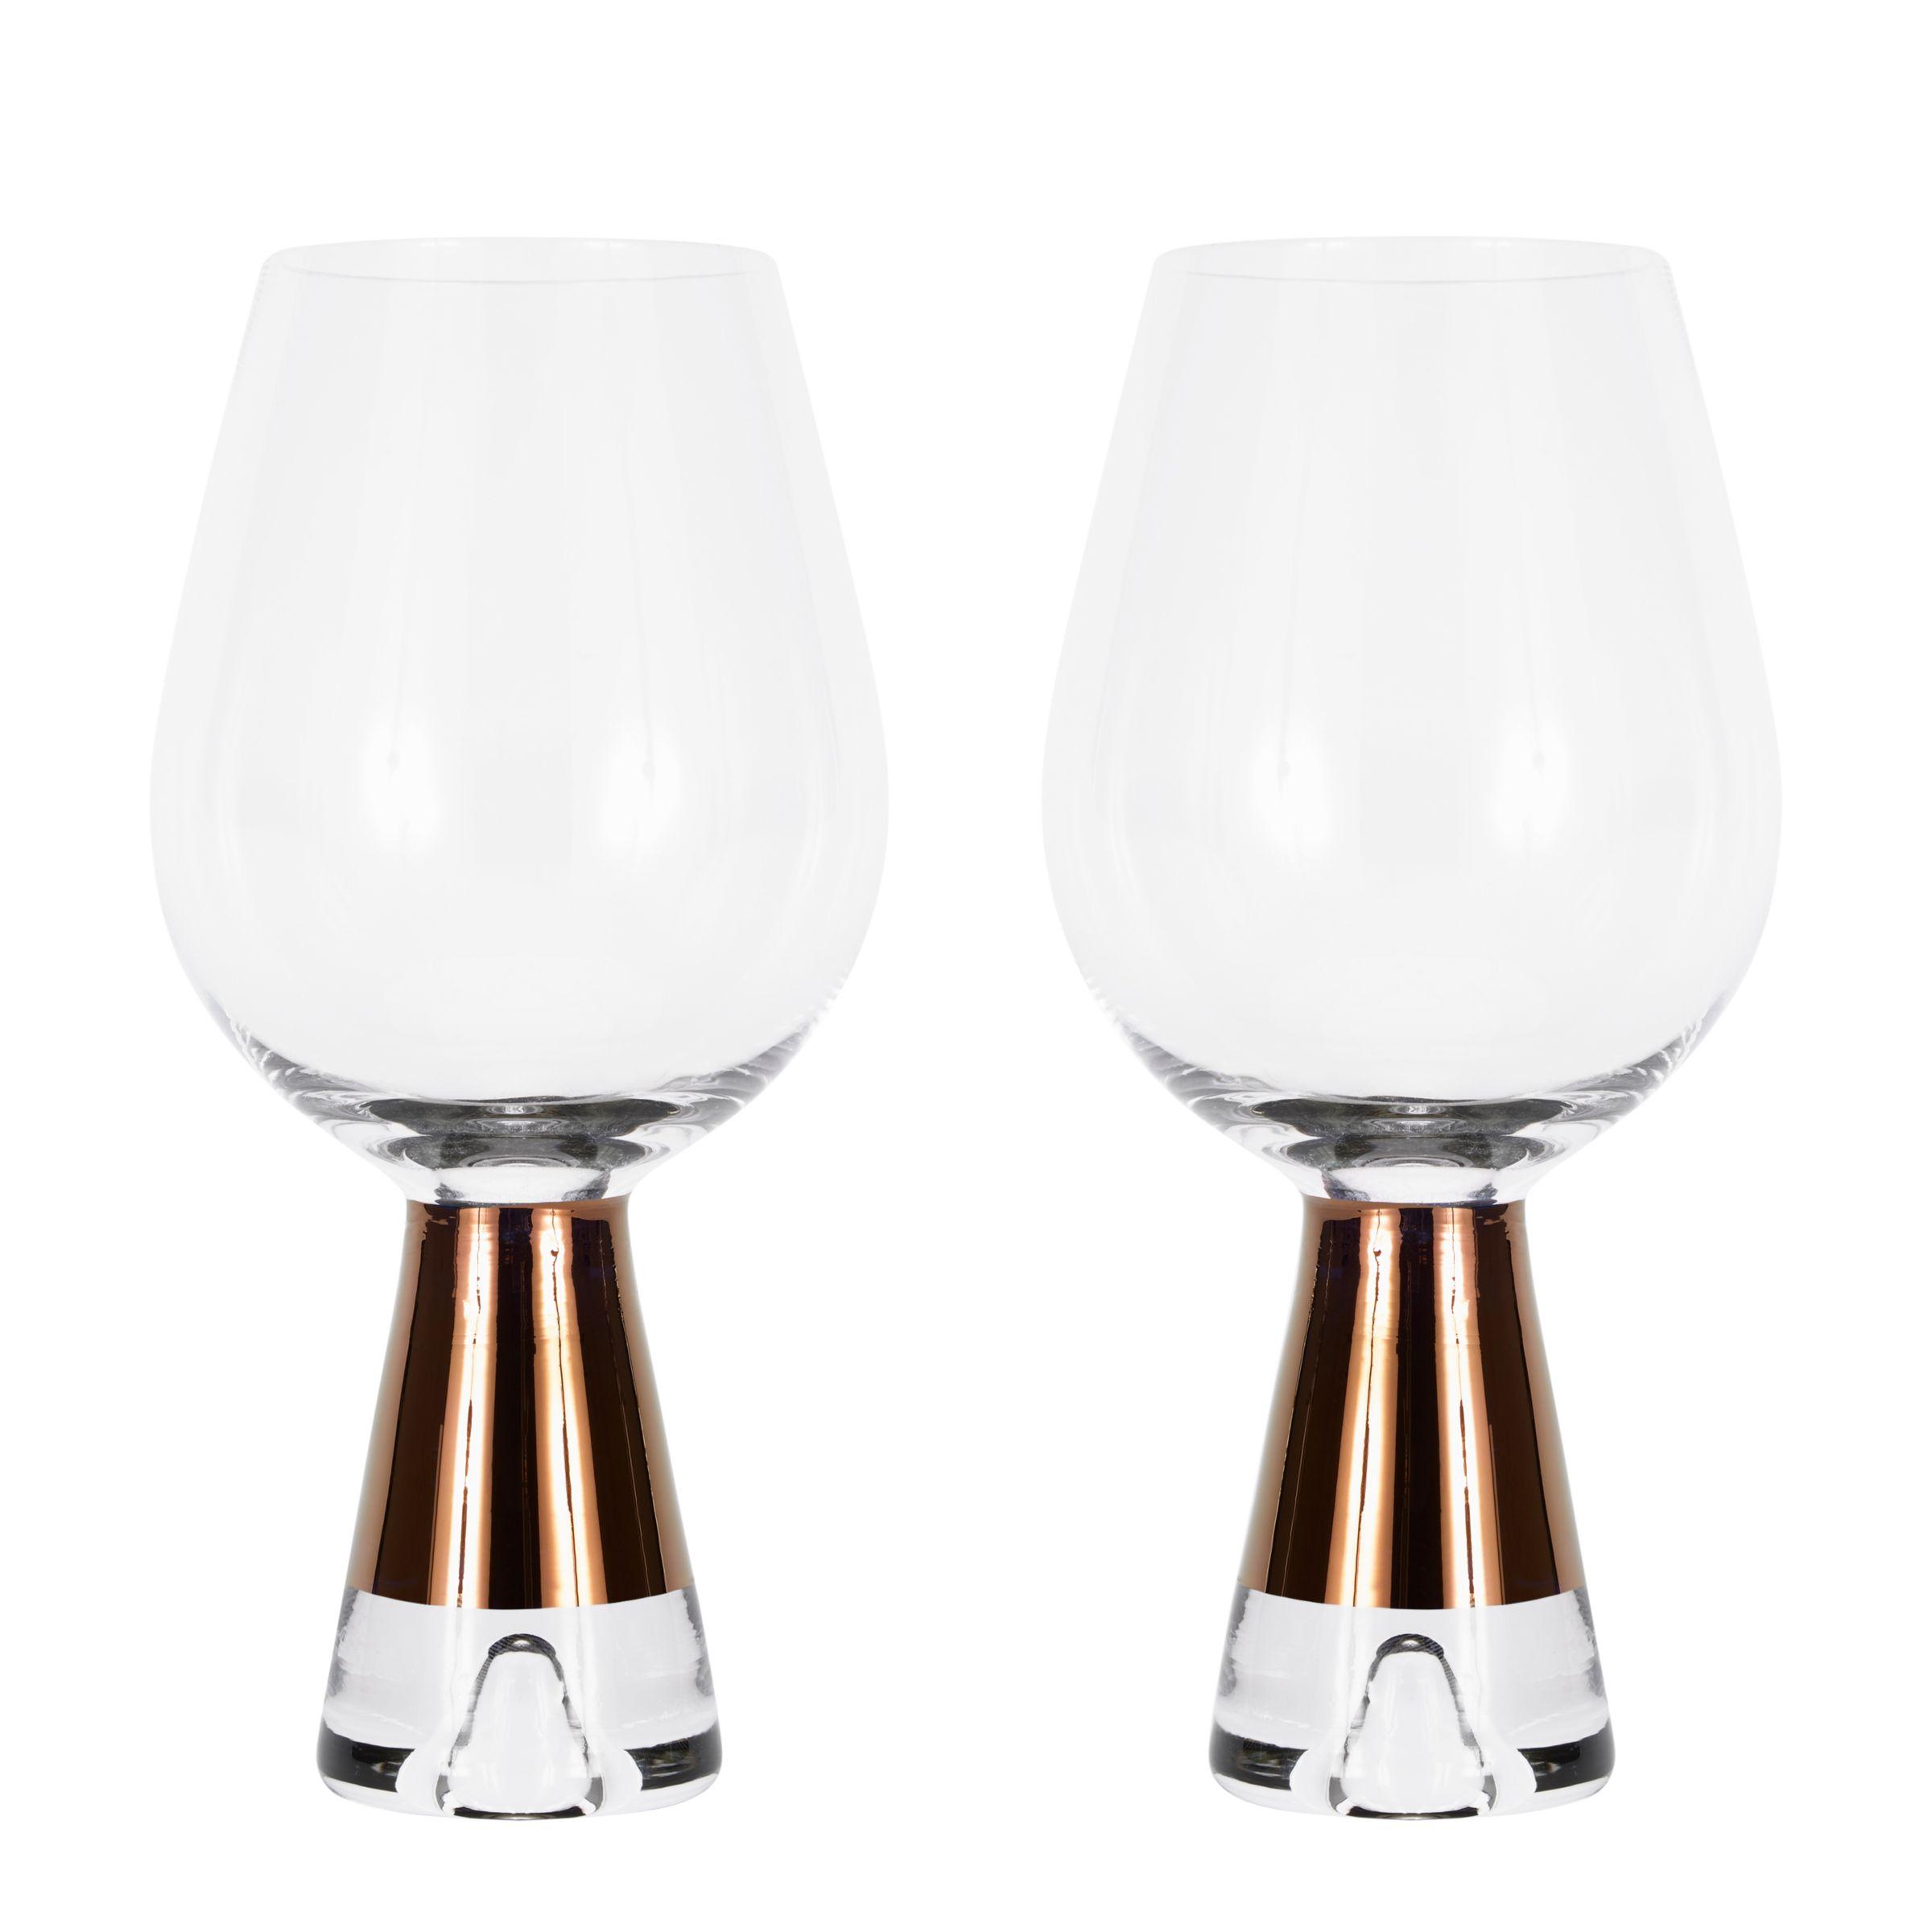 Tom Dixon Tom Dixon Tank Wine Glasses, Set of 2